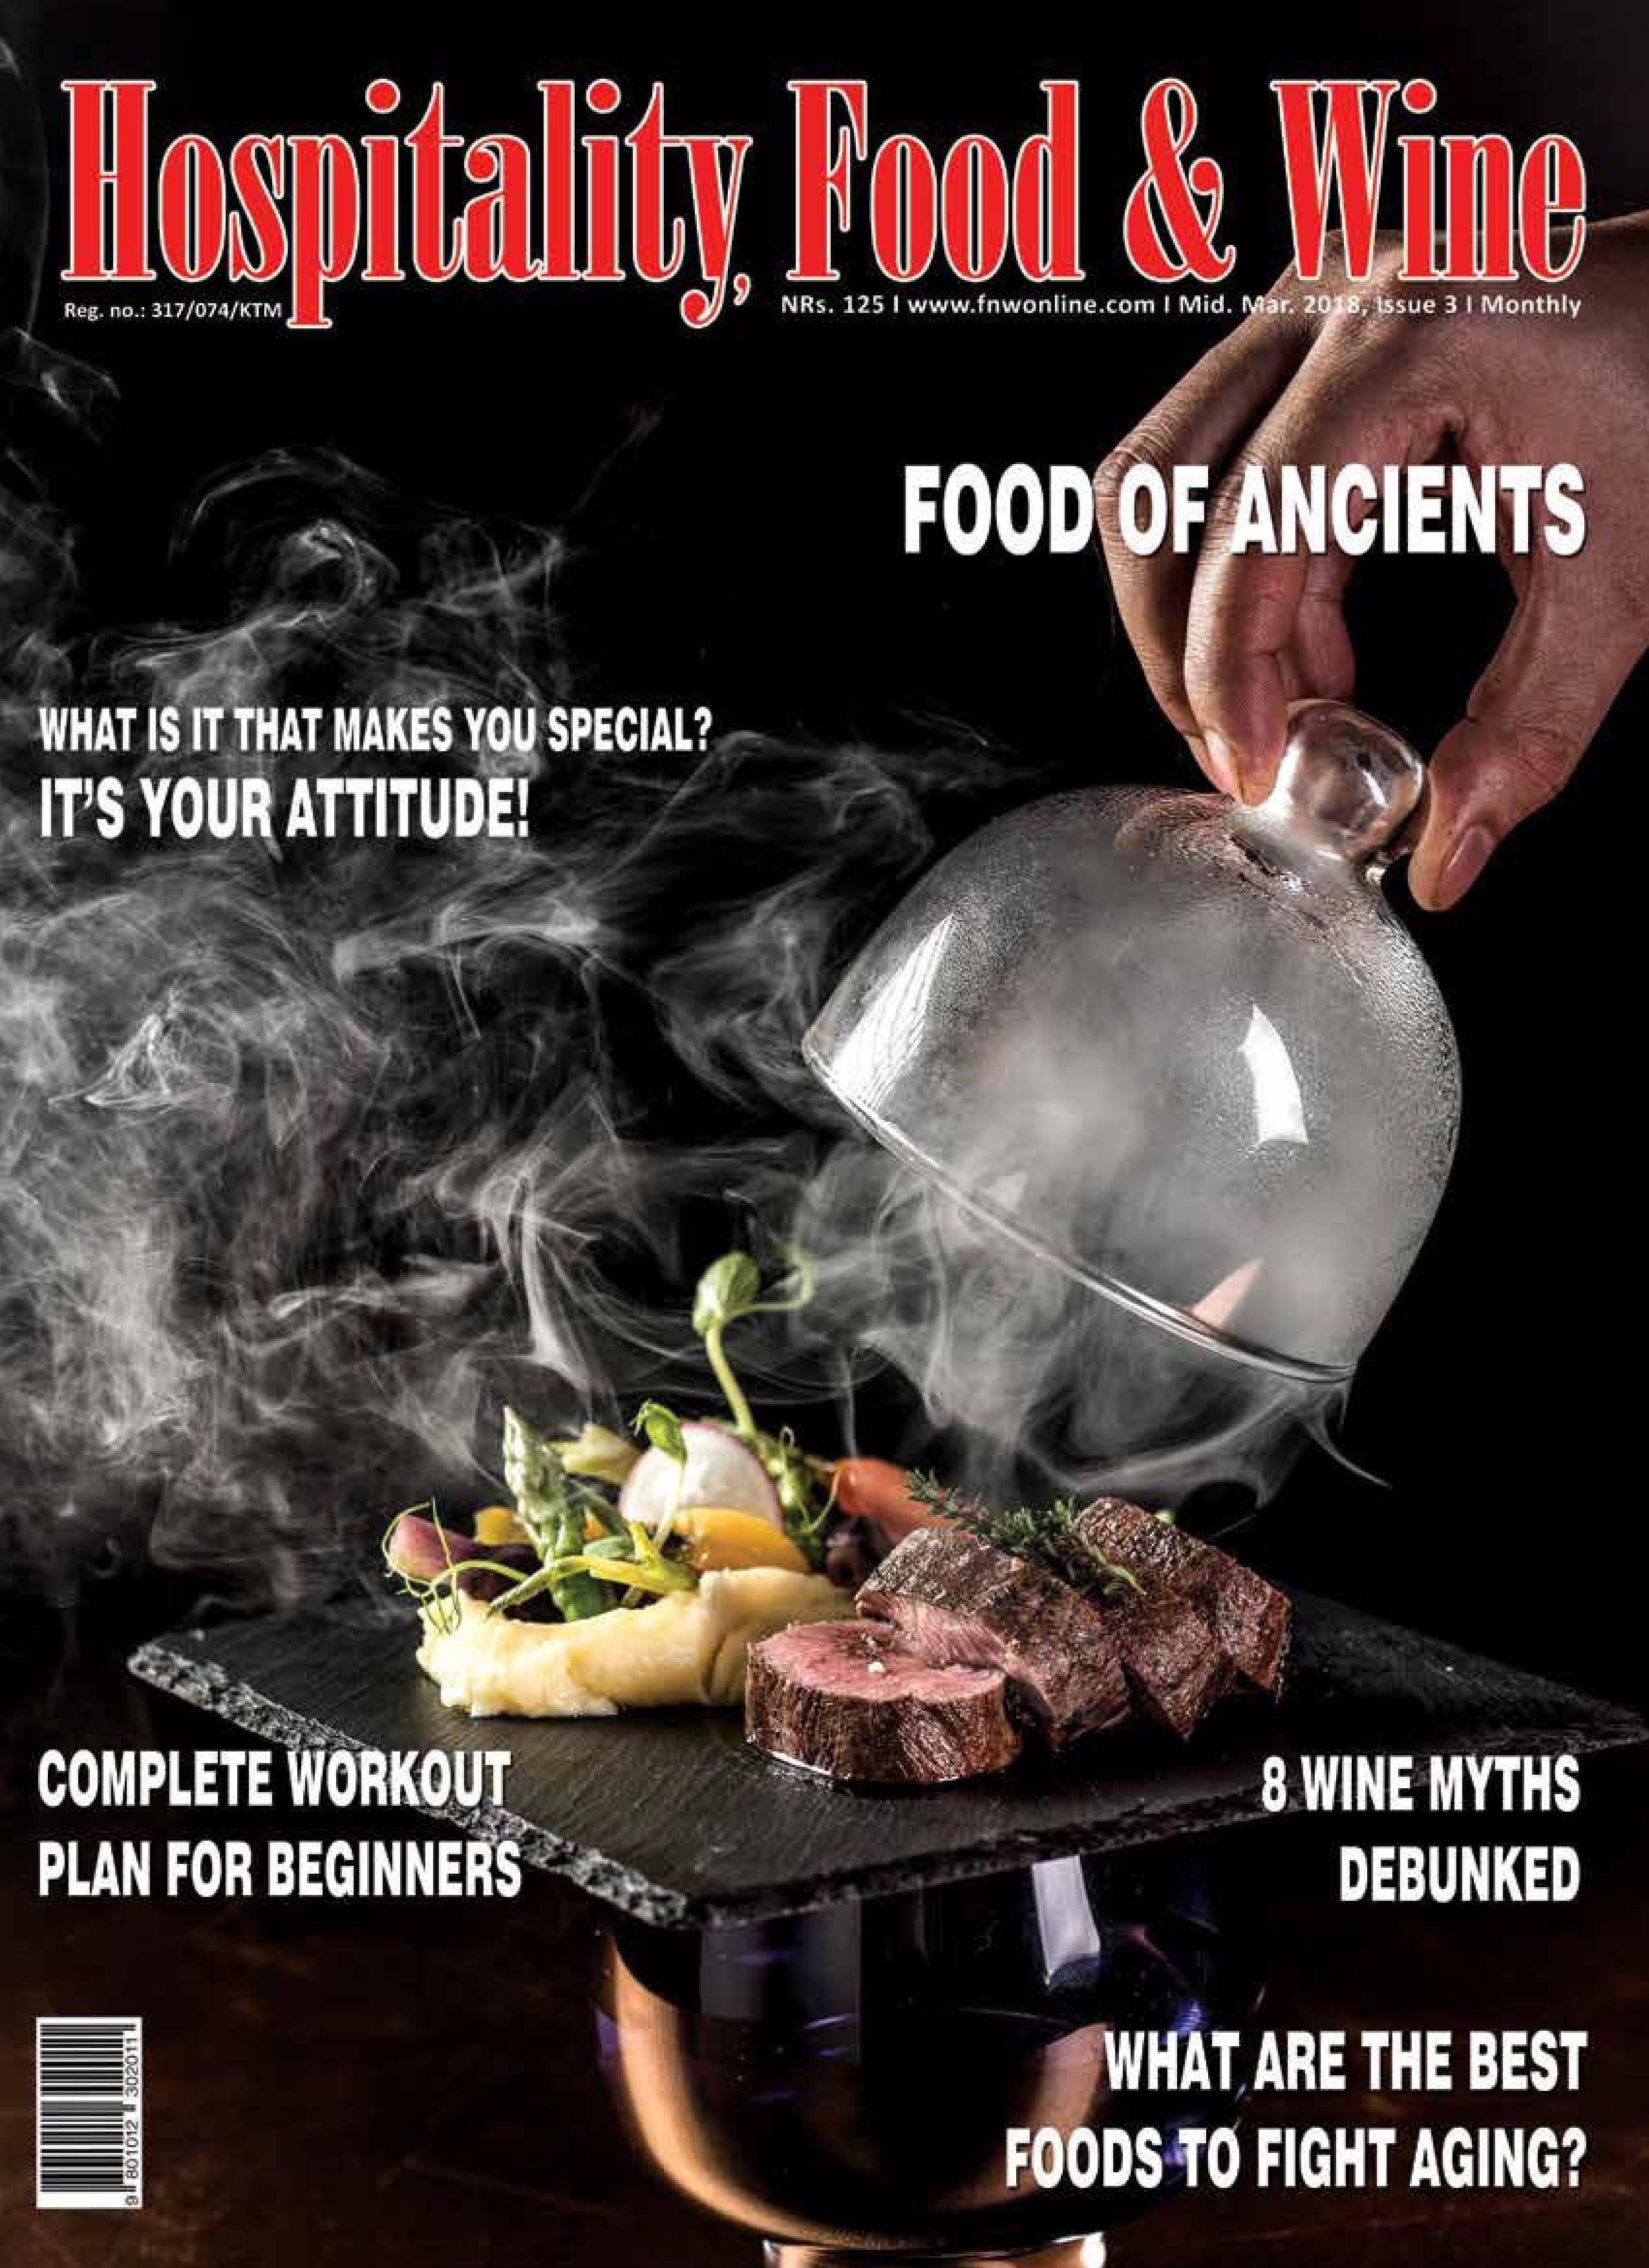 Food & Wine Nepal - April 2018